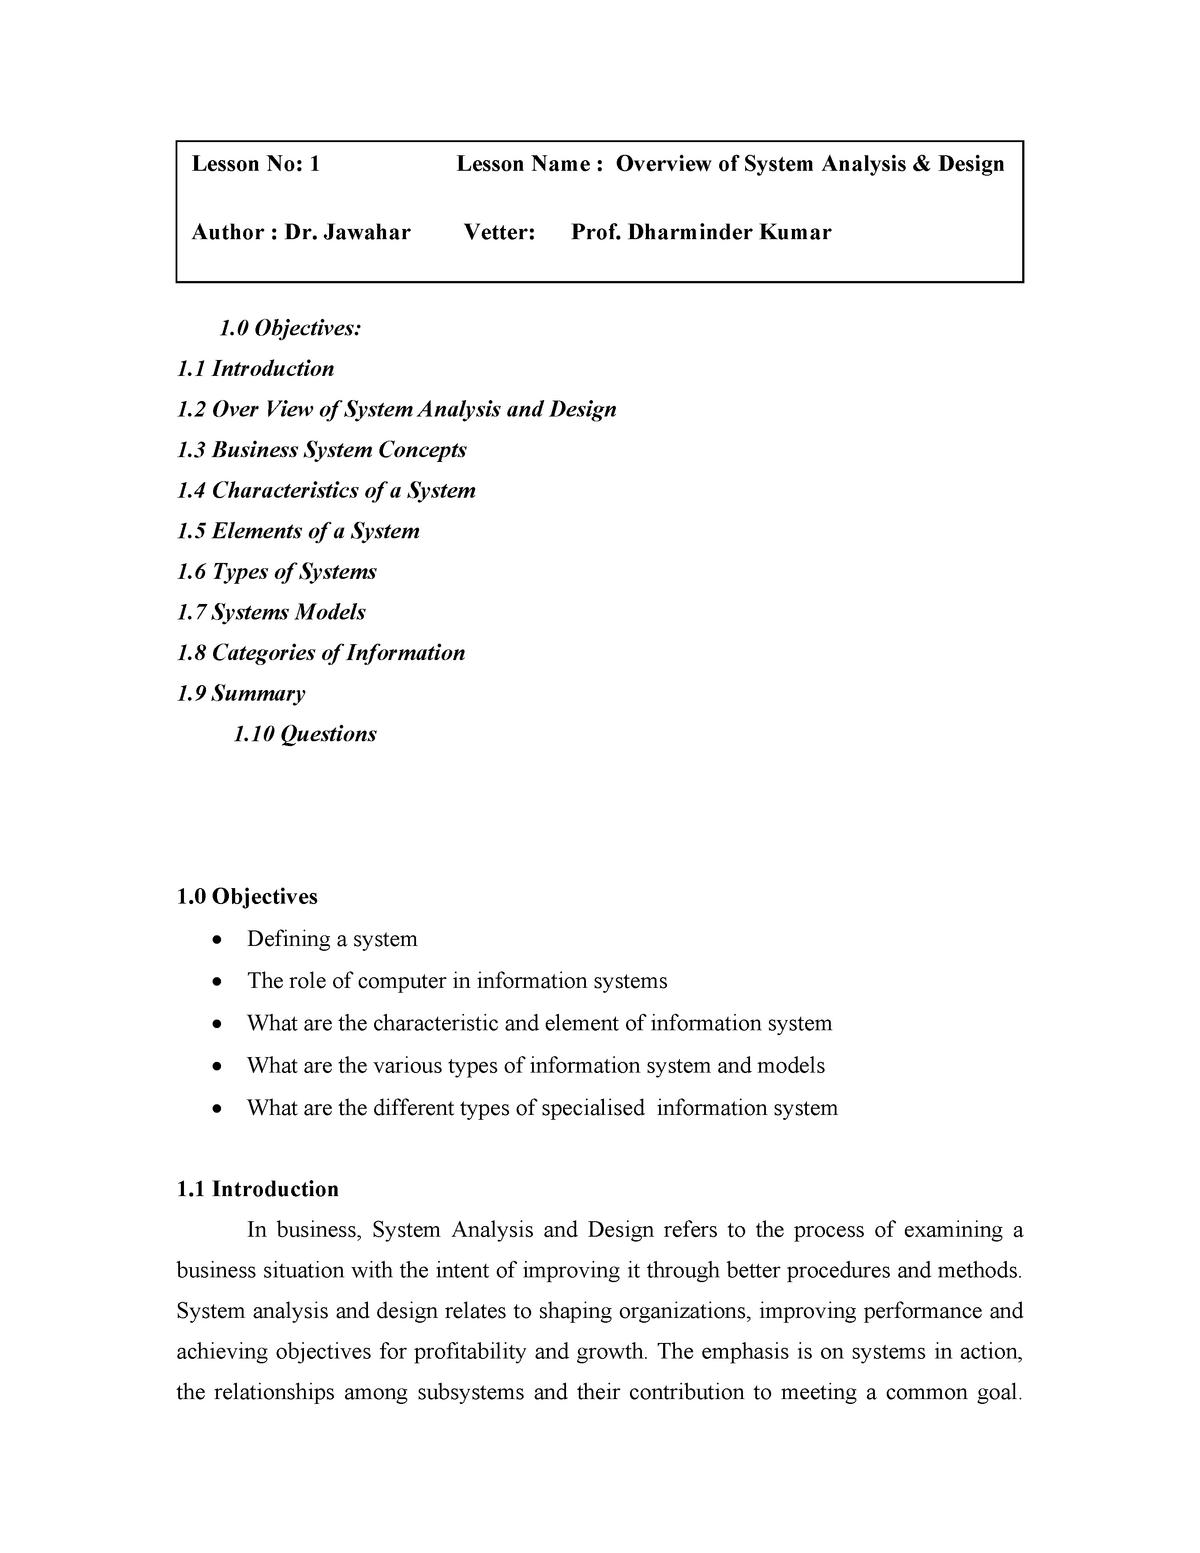 System Analysis And Design Im 305 Udsm Studocu